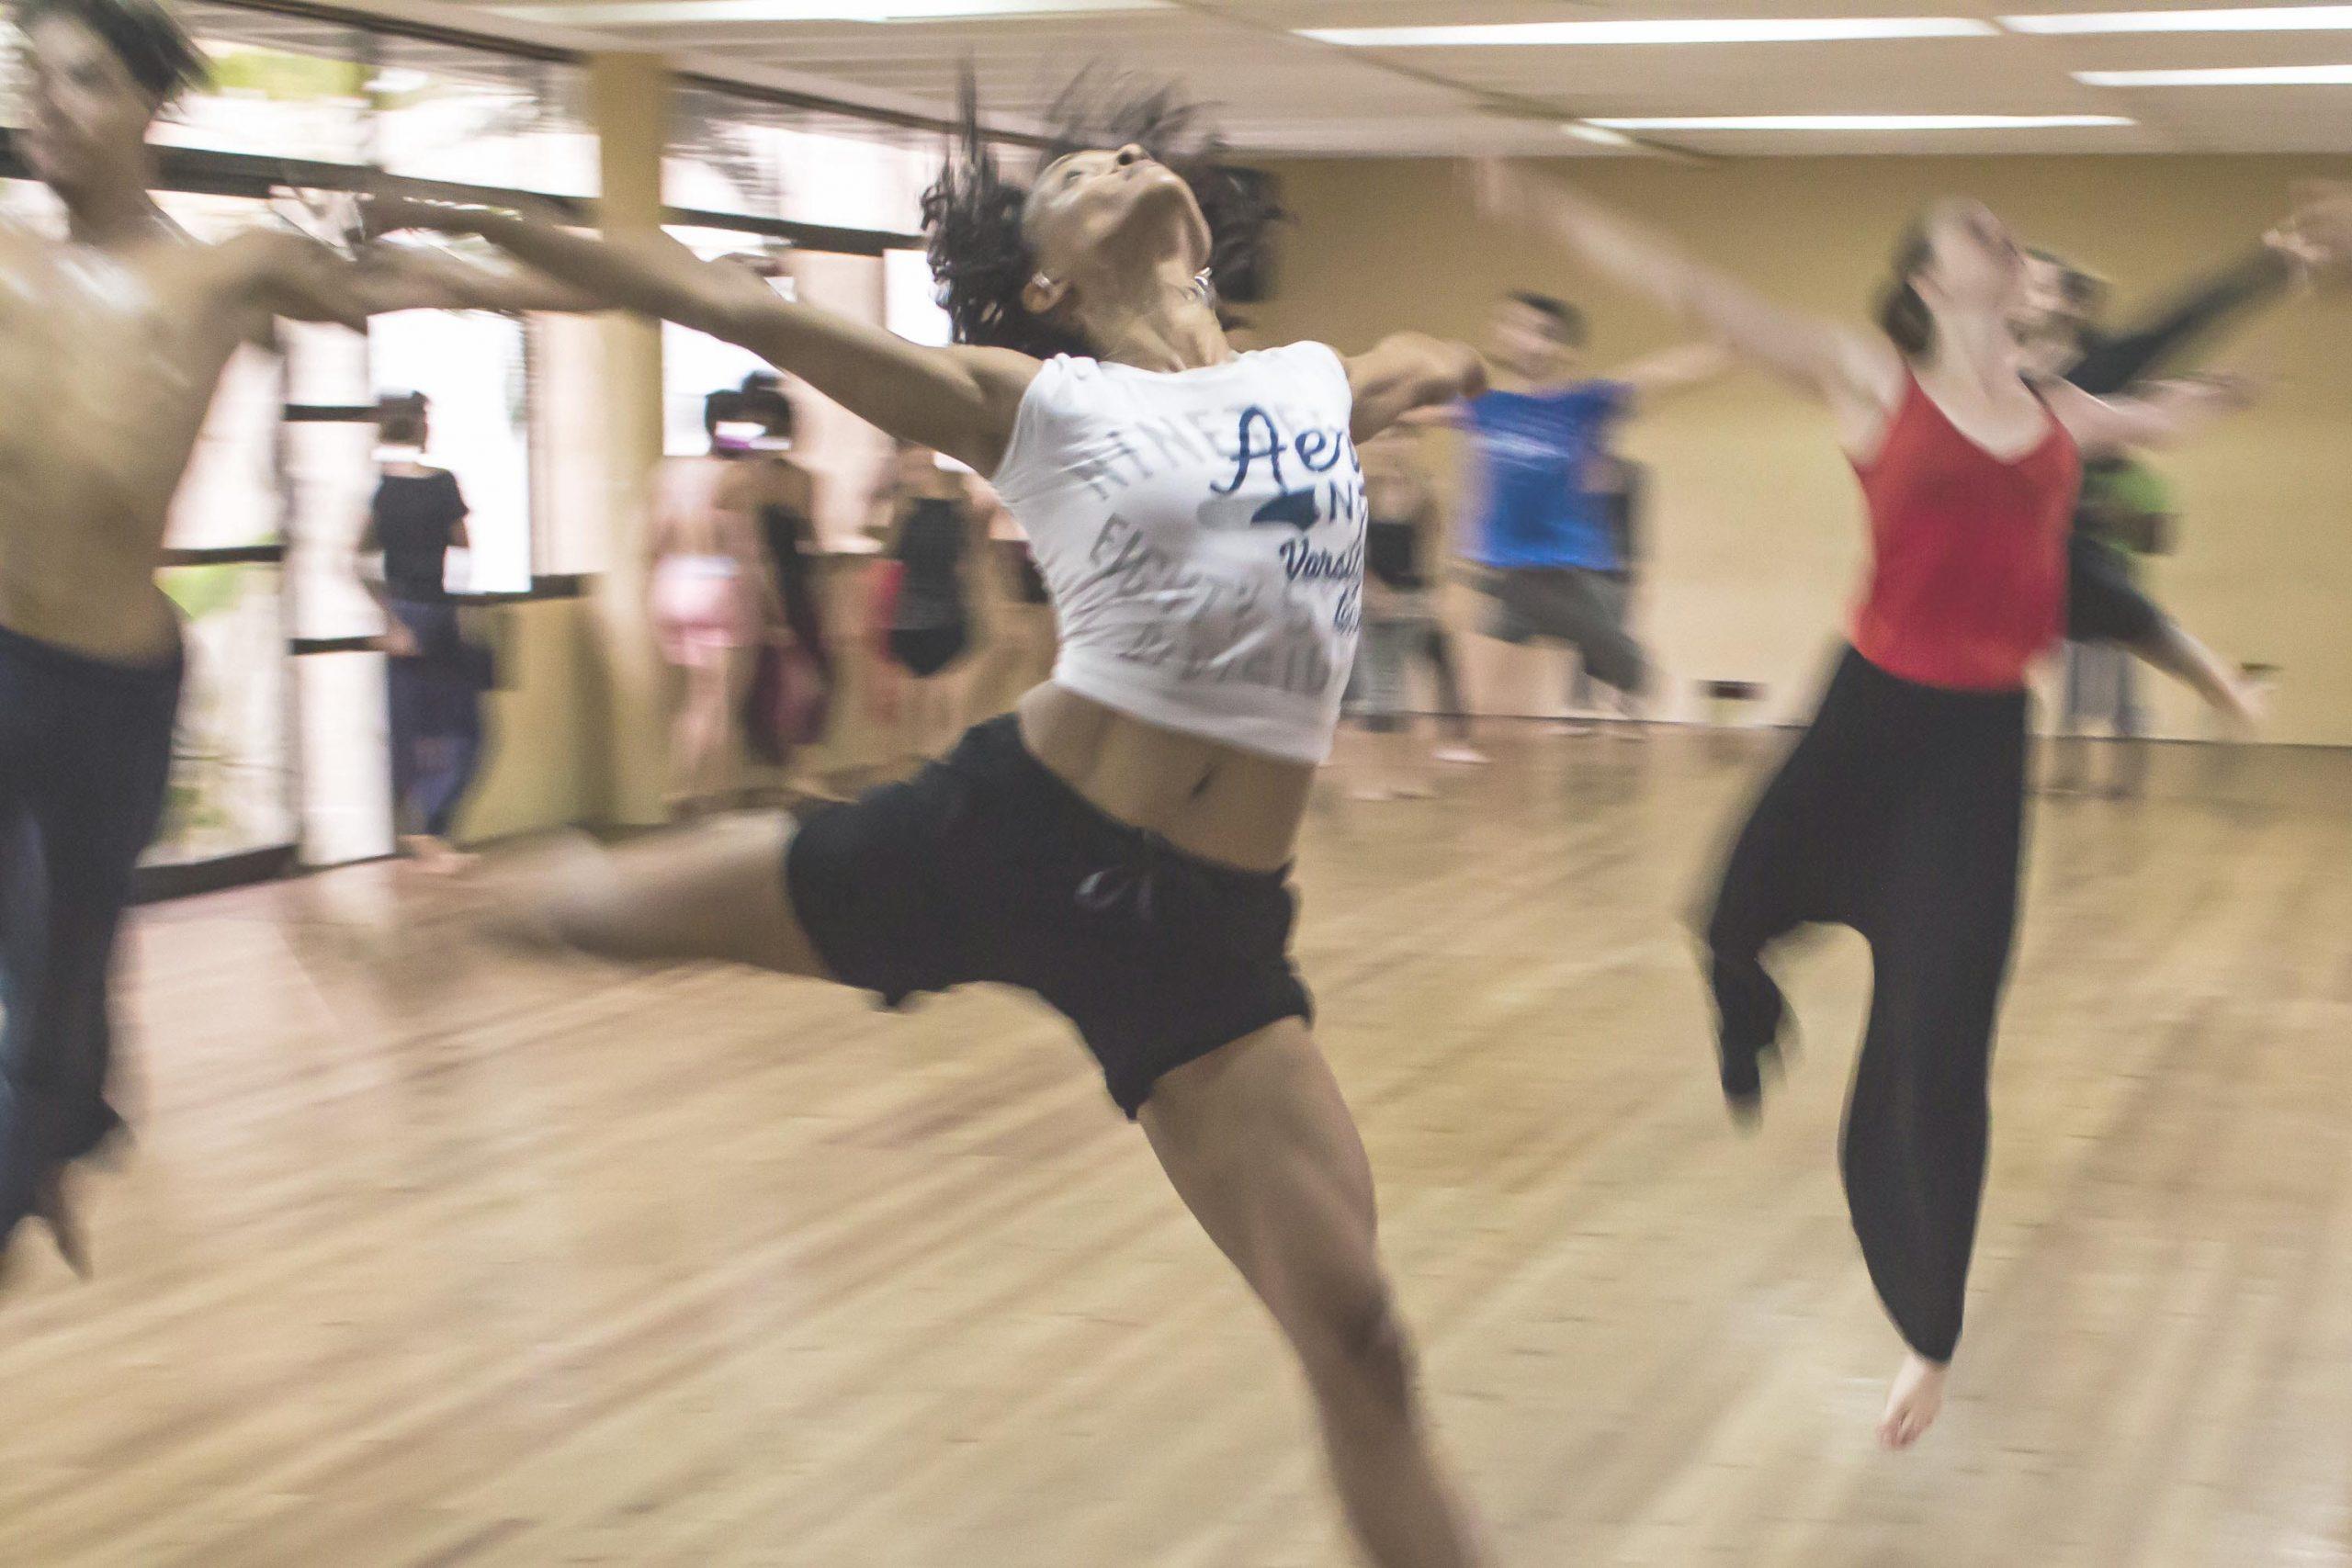 Corso danza Cinisello